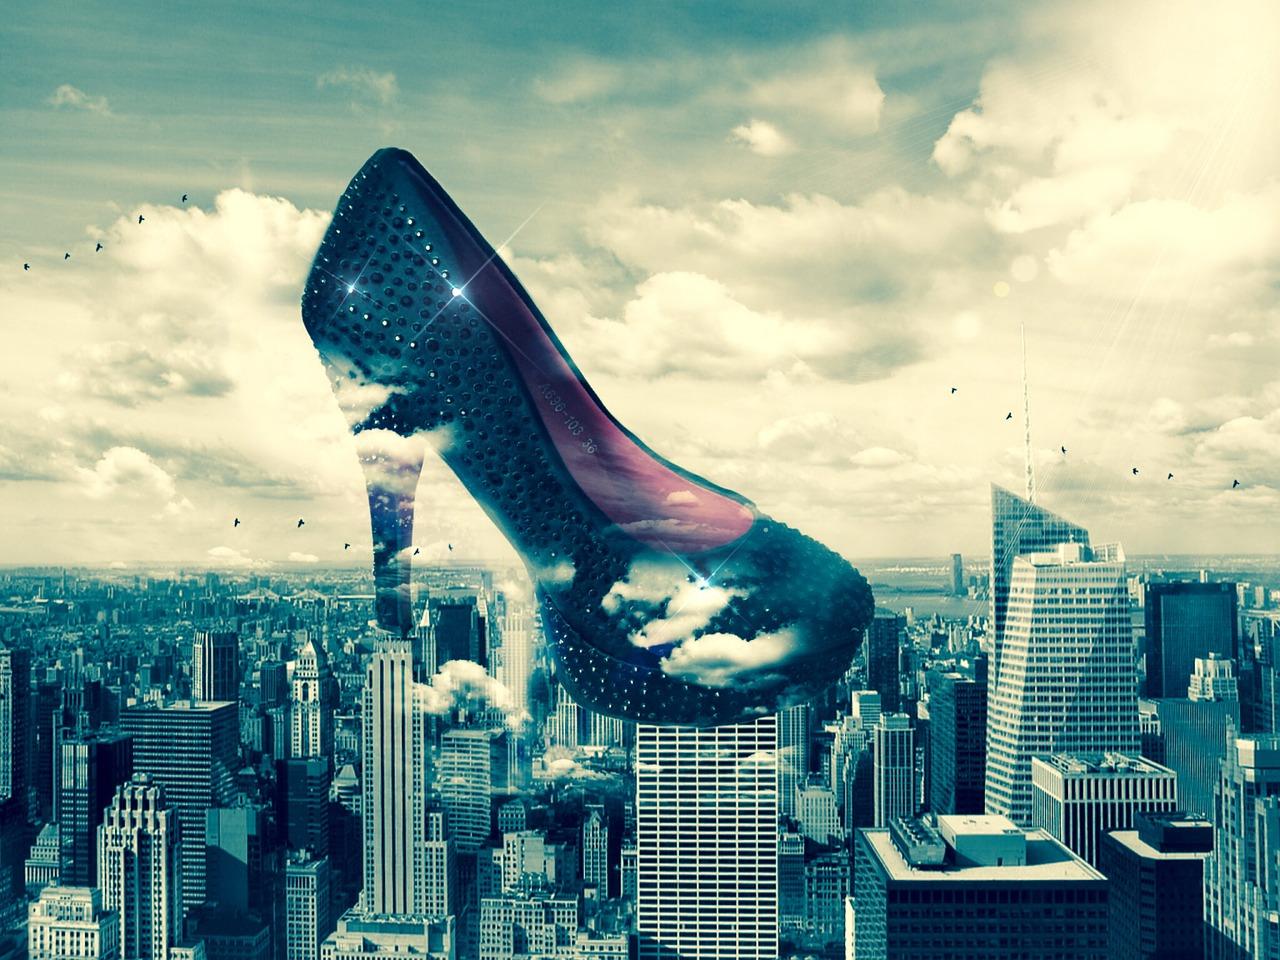 City pumps highheels, shoe, clouds